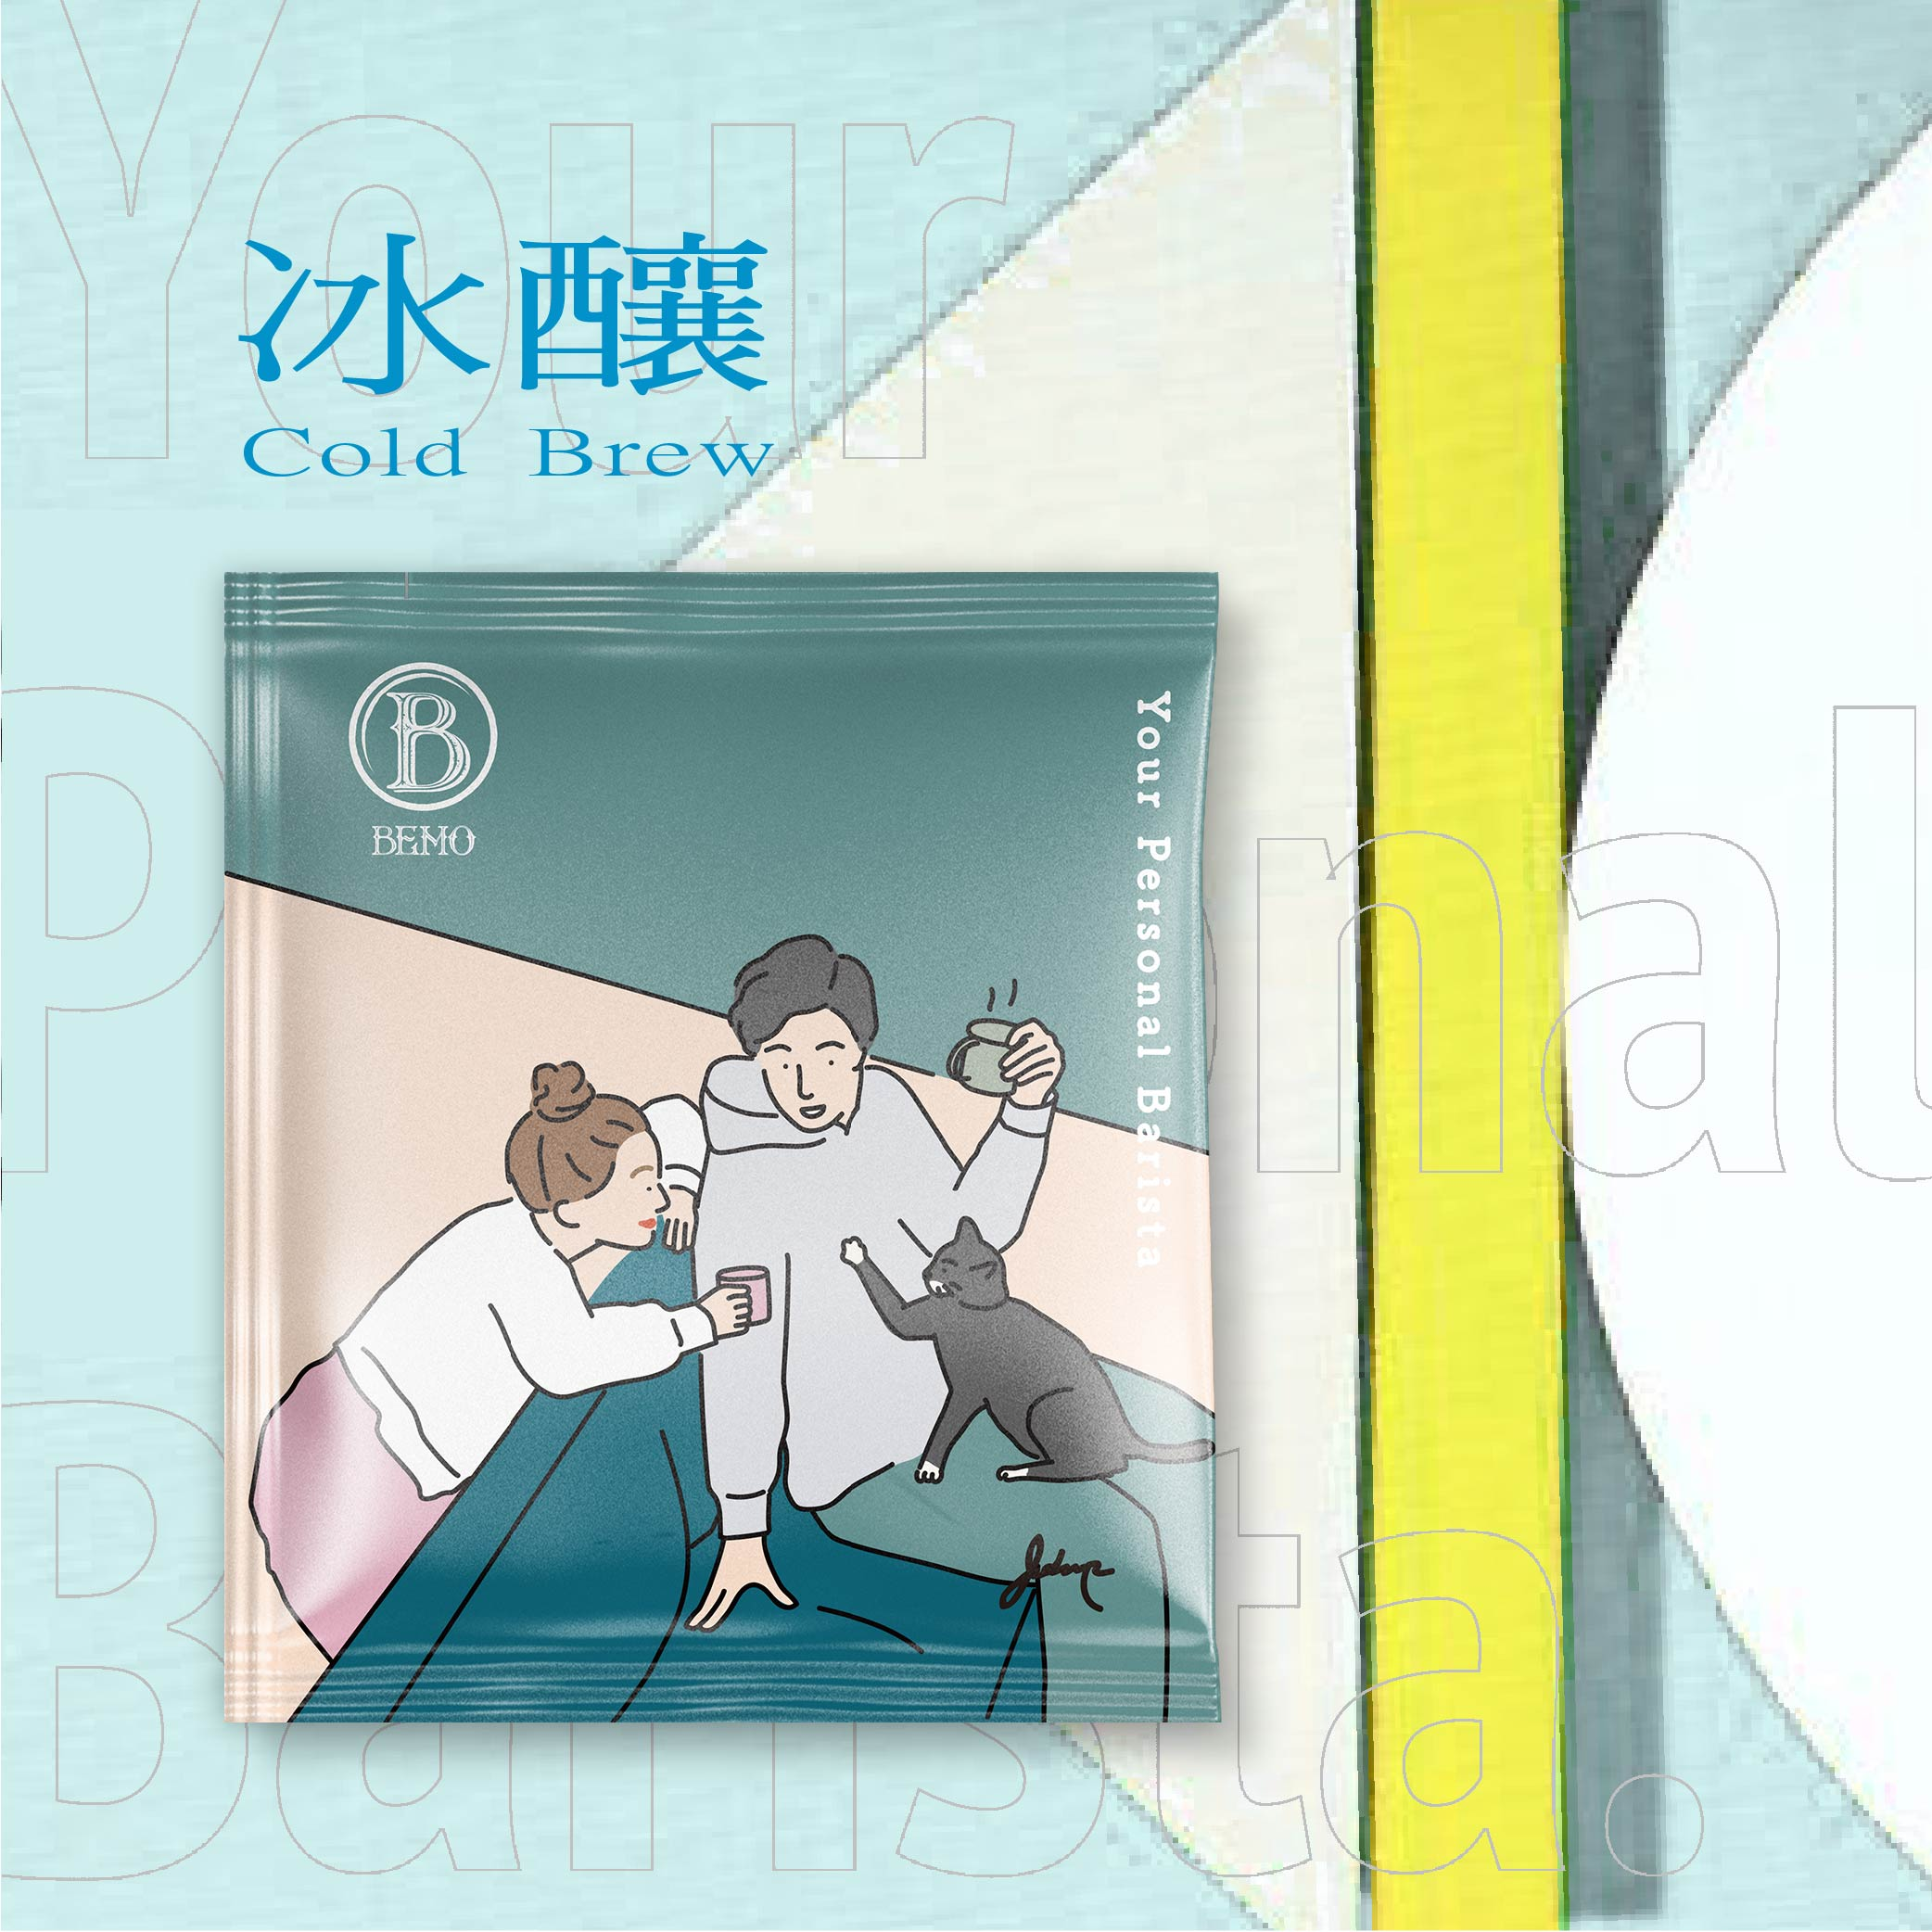 BEMO Café 冰釀系列 / 西達摩 水洗 吳則霖特選批次(中深焙)